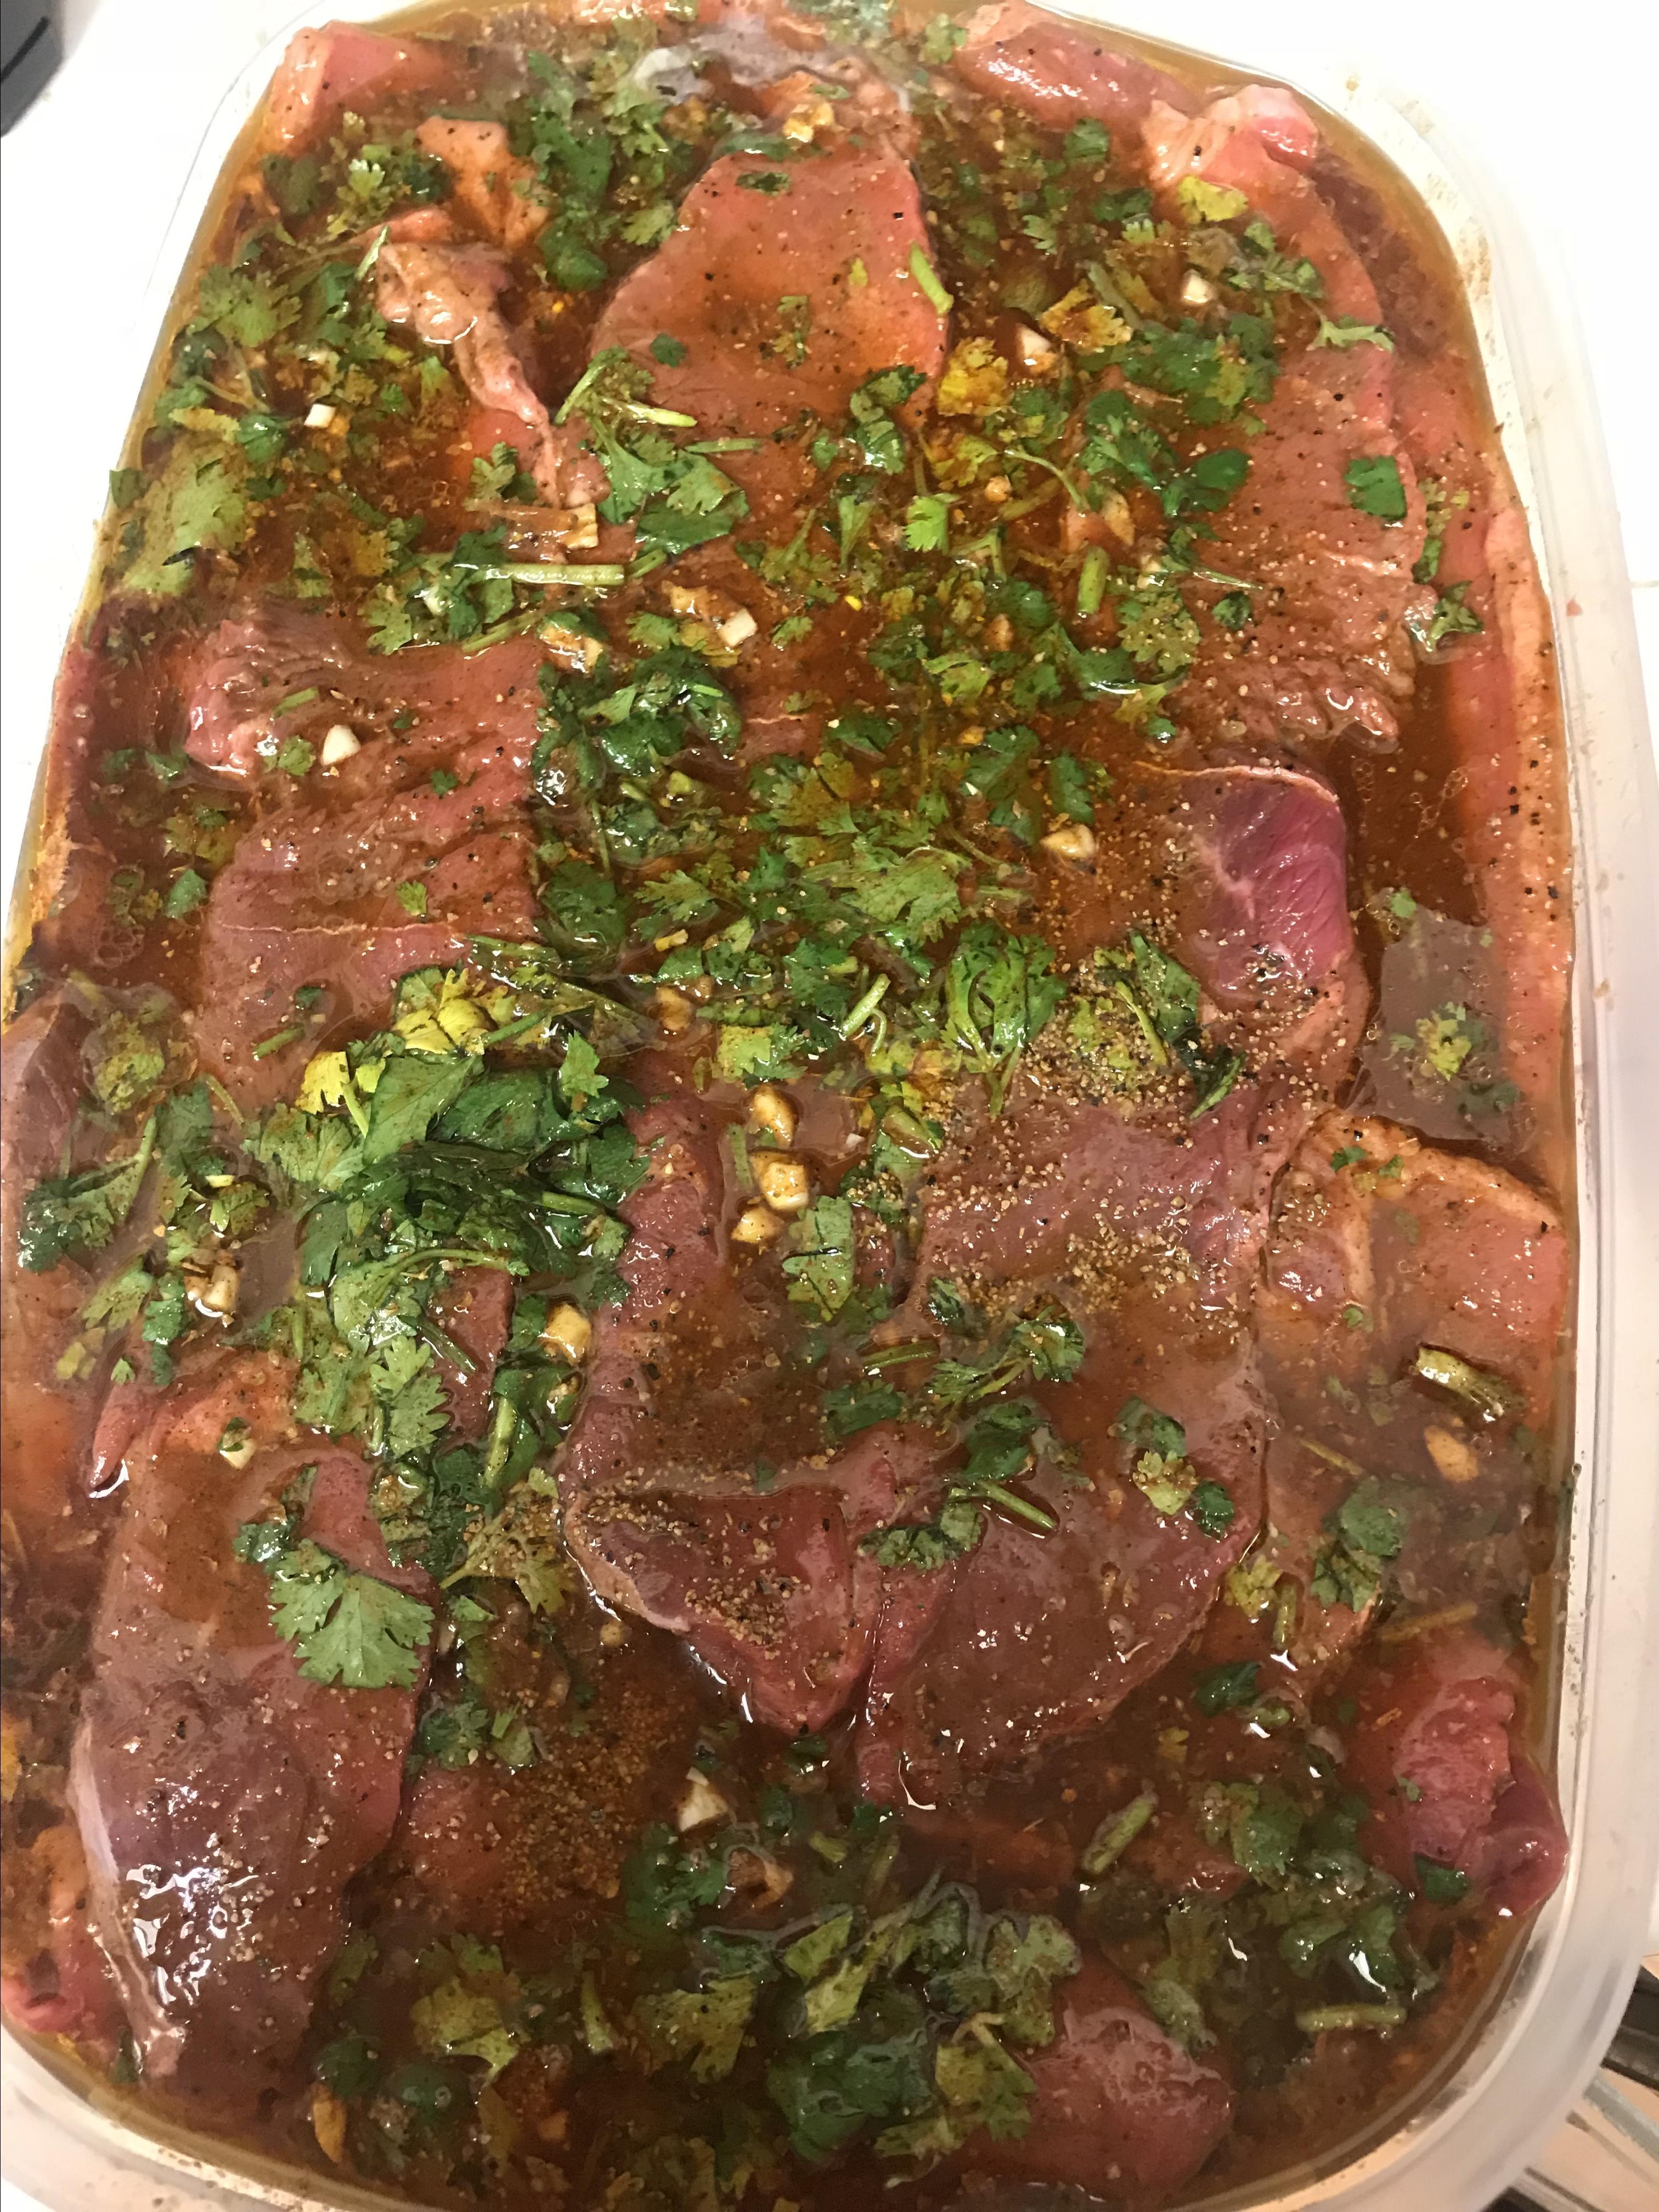 Lisa's Favorite Carne Asada Marinade whit.mills806